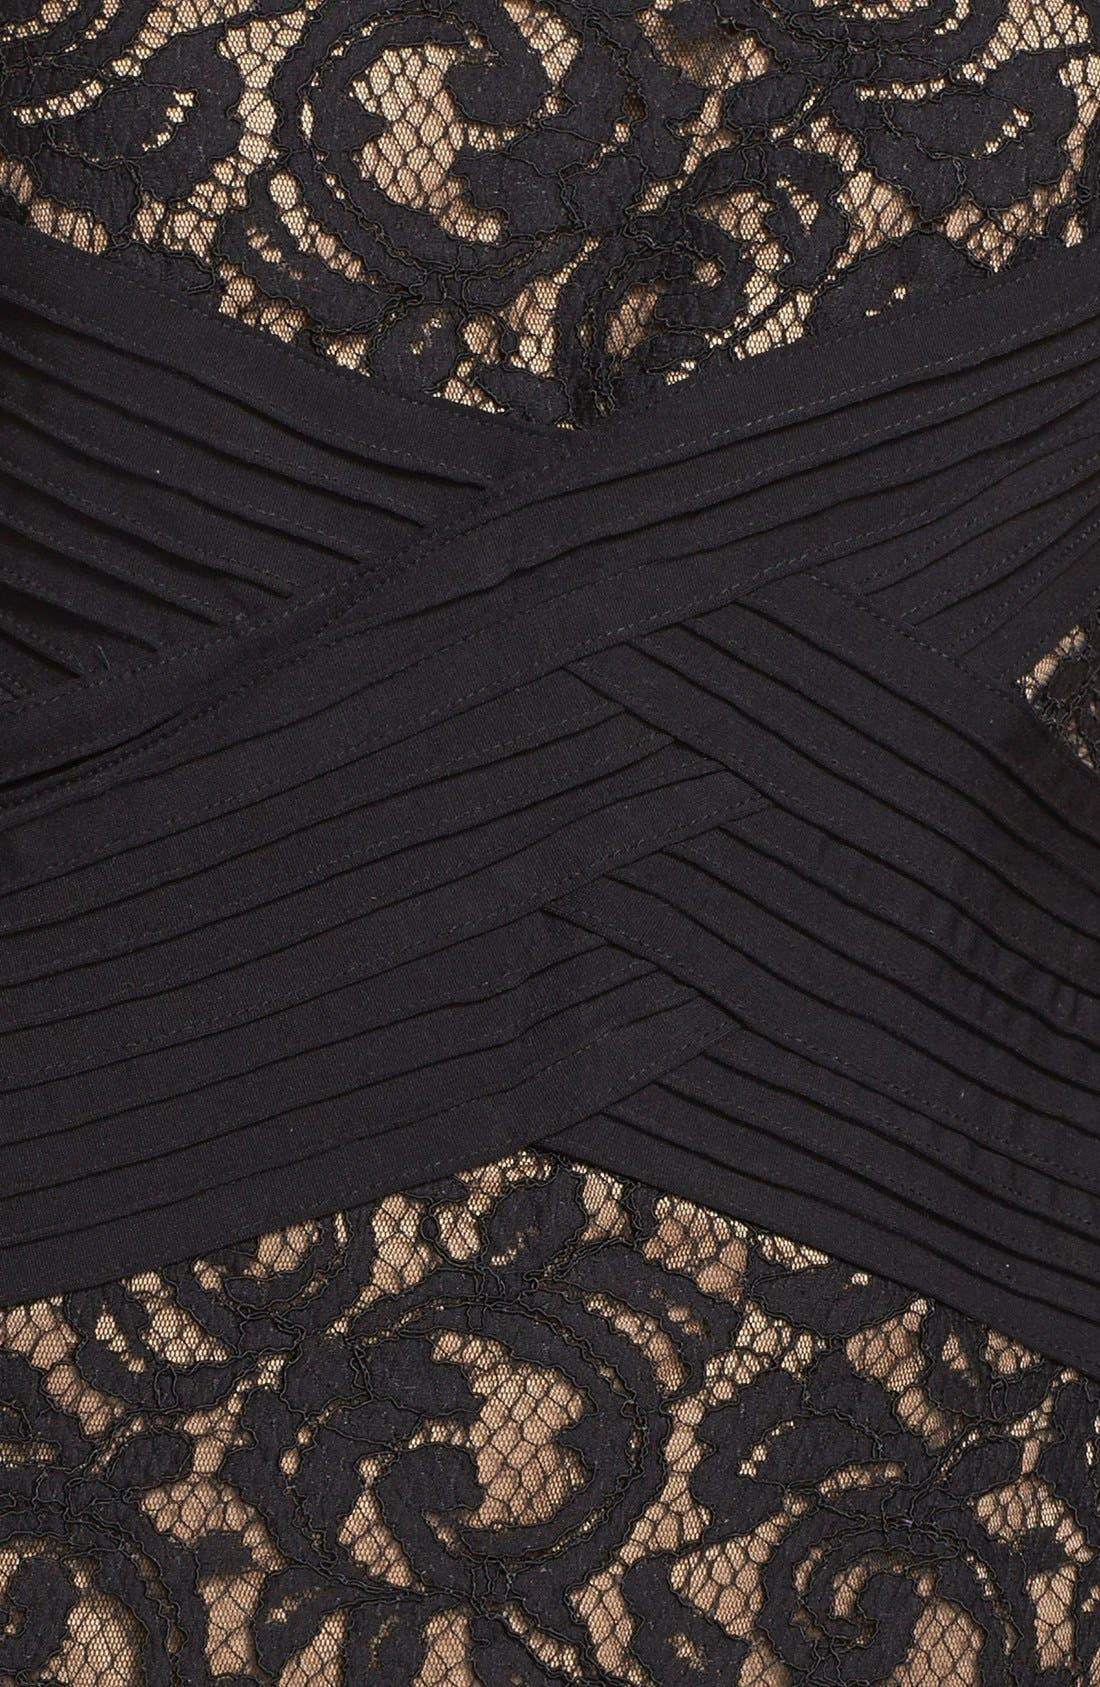 Crisscross Waist Lace Sheath Dress,                             Alternate thumbnail 4, color,                             004